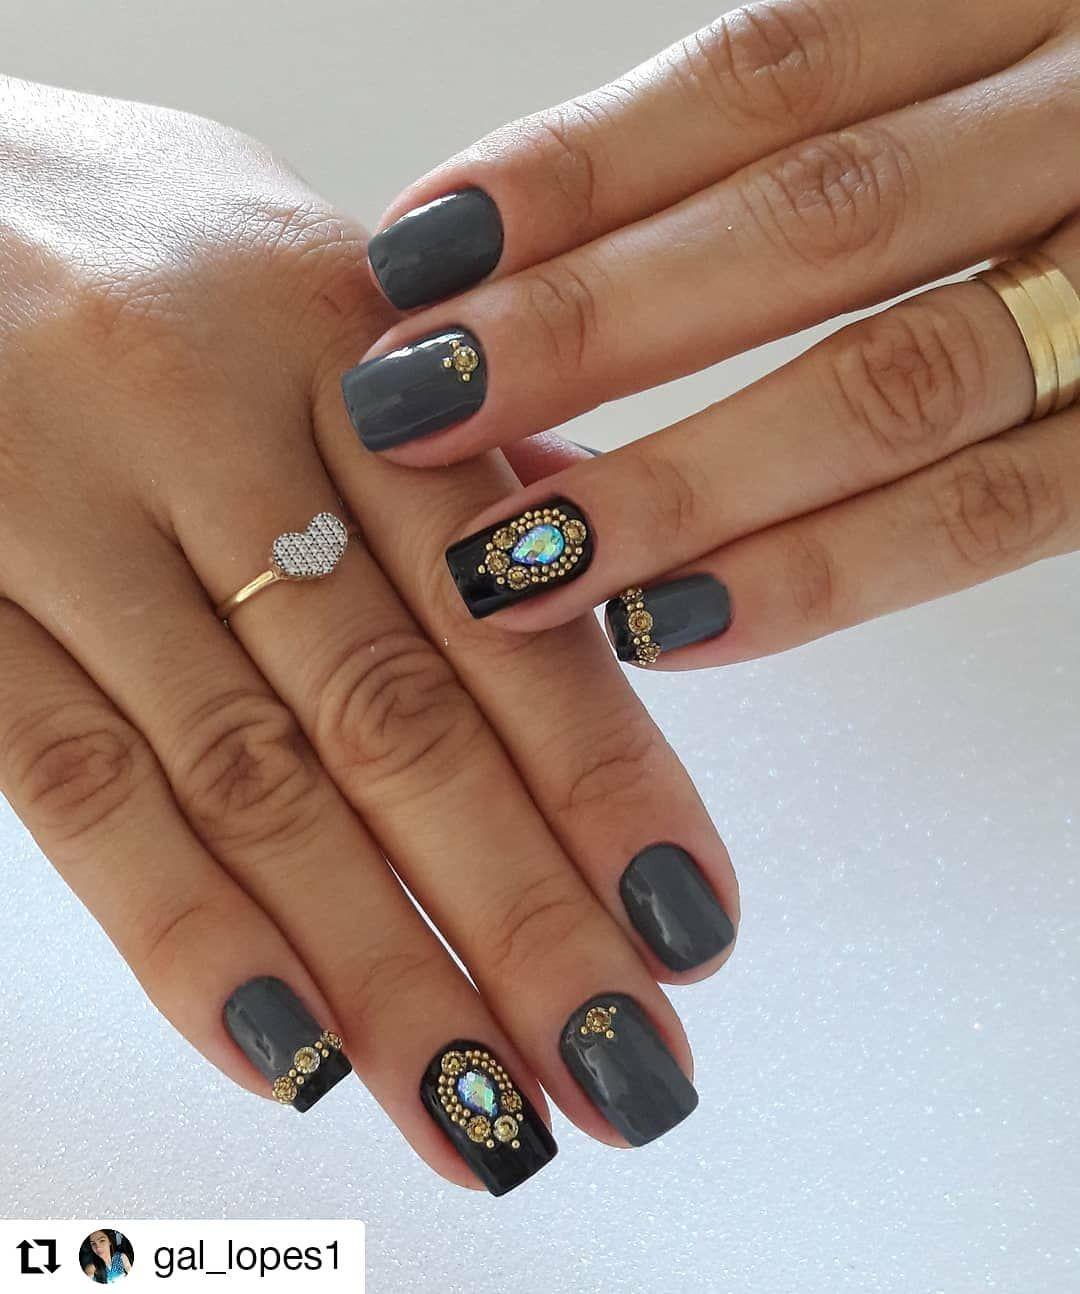 Repost Gal Lopes1 Nail Art Usando Cinza Milenio Da Avon Nails Nail Repost Gal Lopes1 Nail Art Usando Cin Avon Nails Swag Nails Nail Art